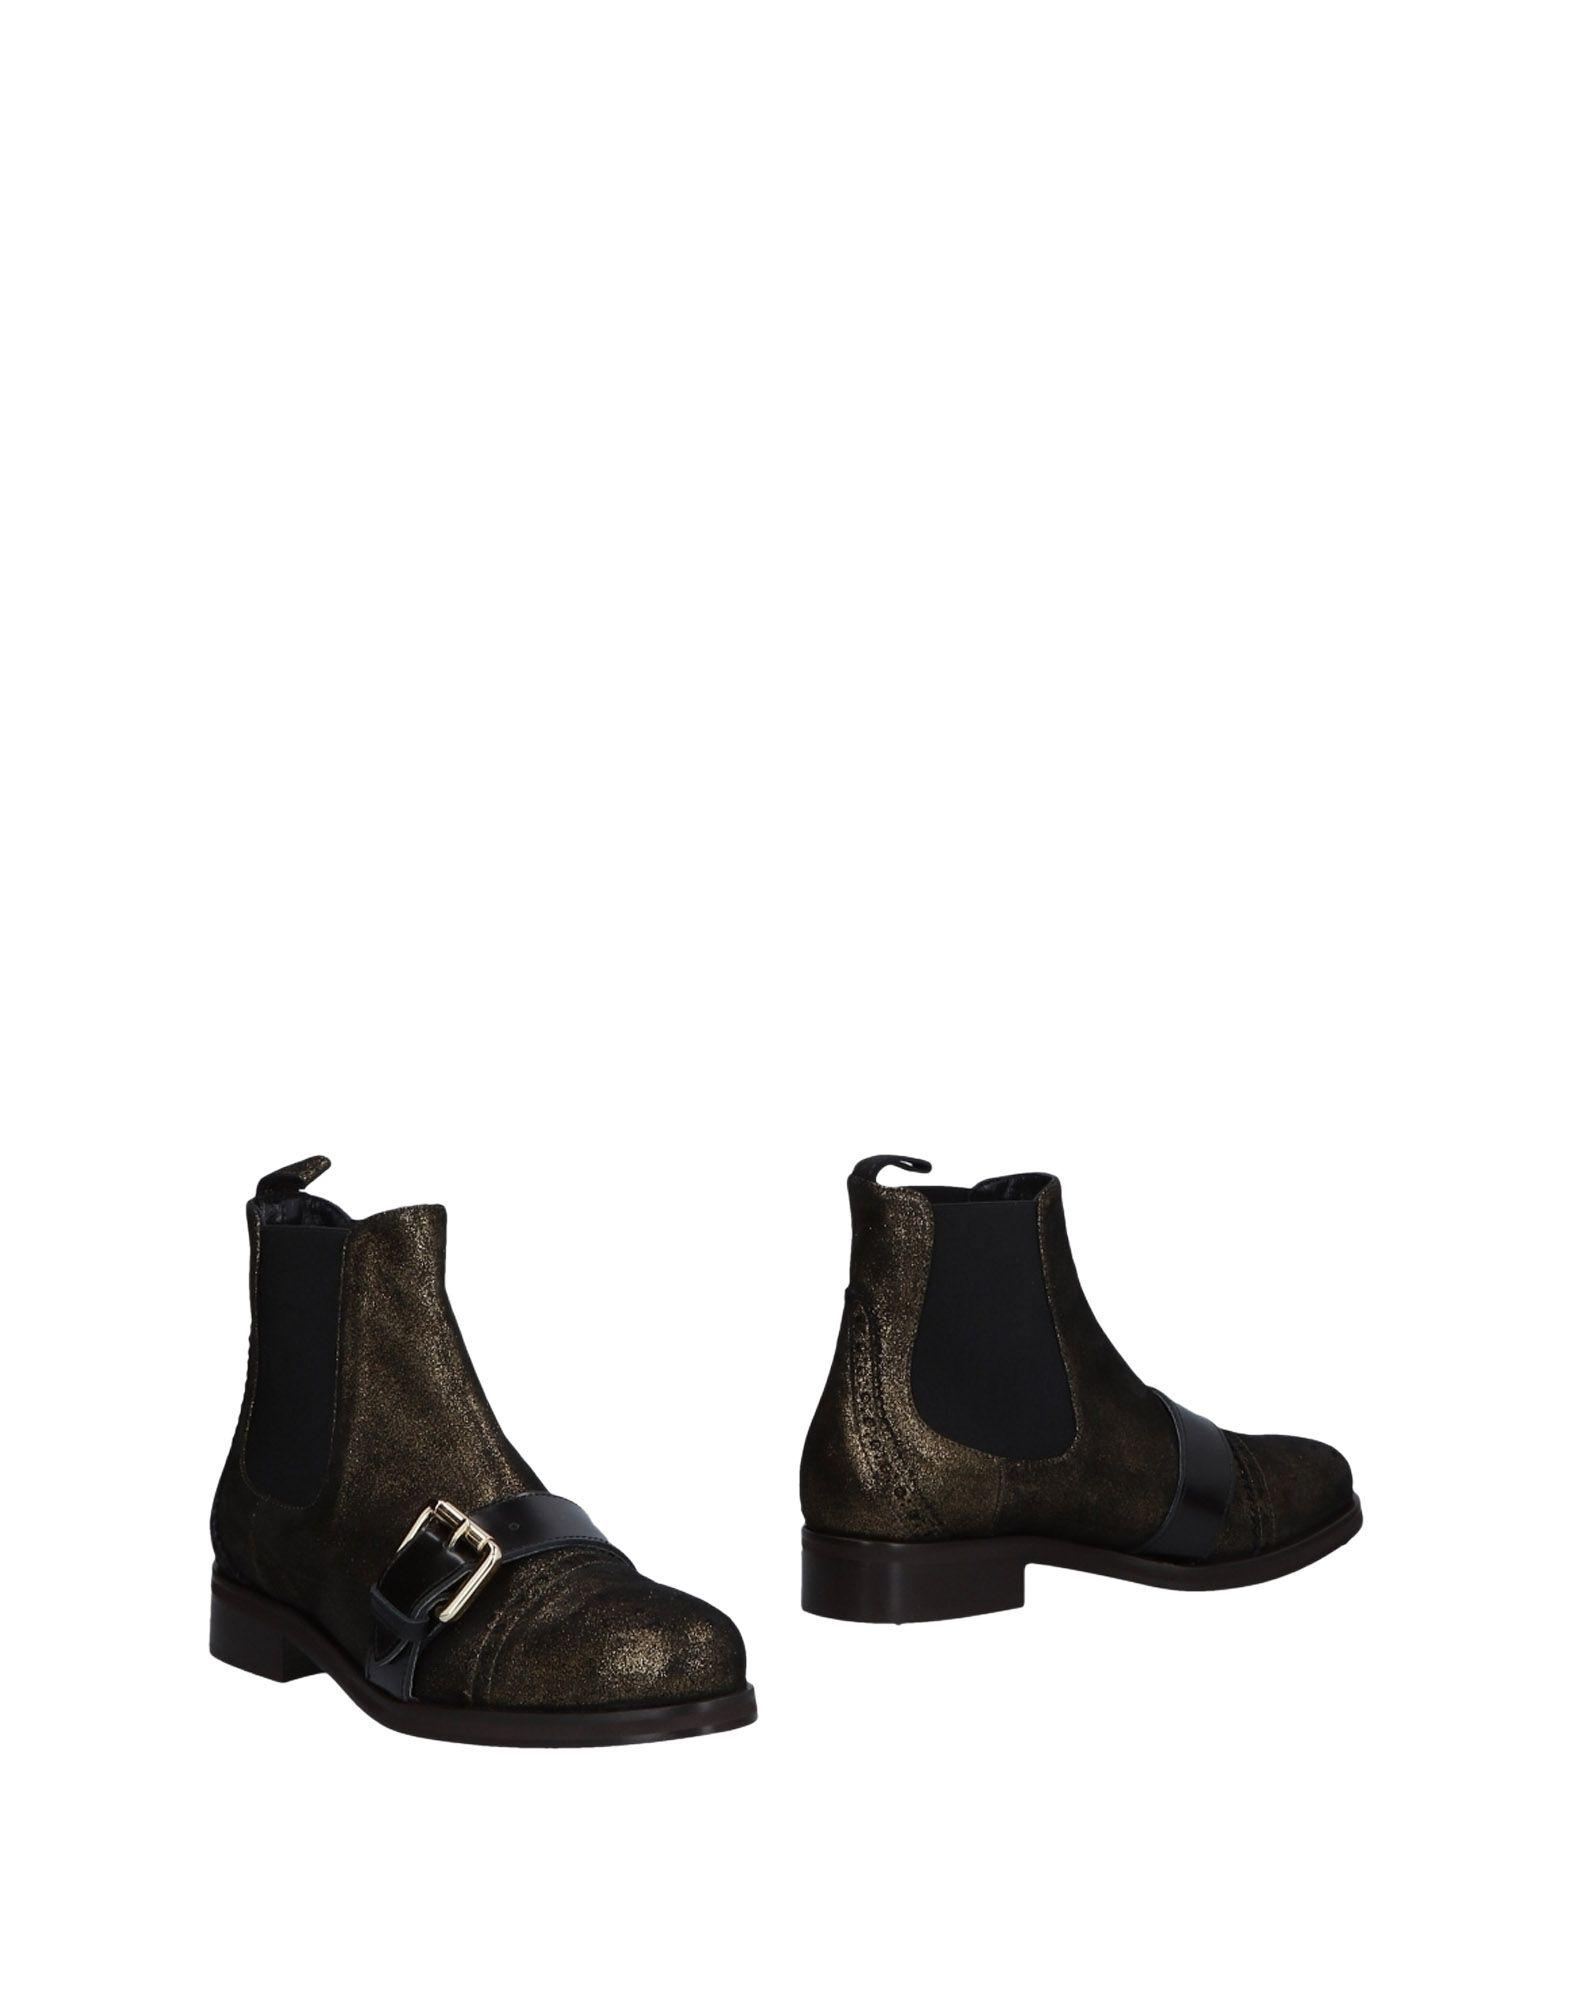 Rabatt Schuhe Damen Giancarlo Paoli Chelsea Boots Damen Schuhe  11474847DP bbe2d3